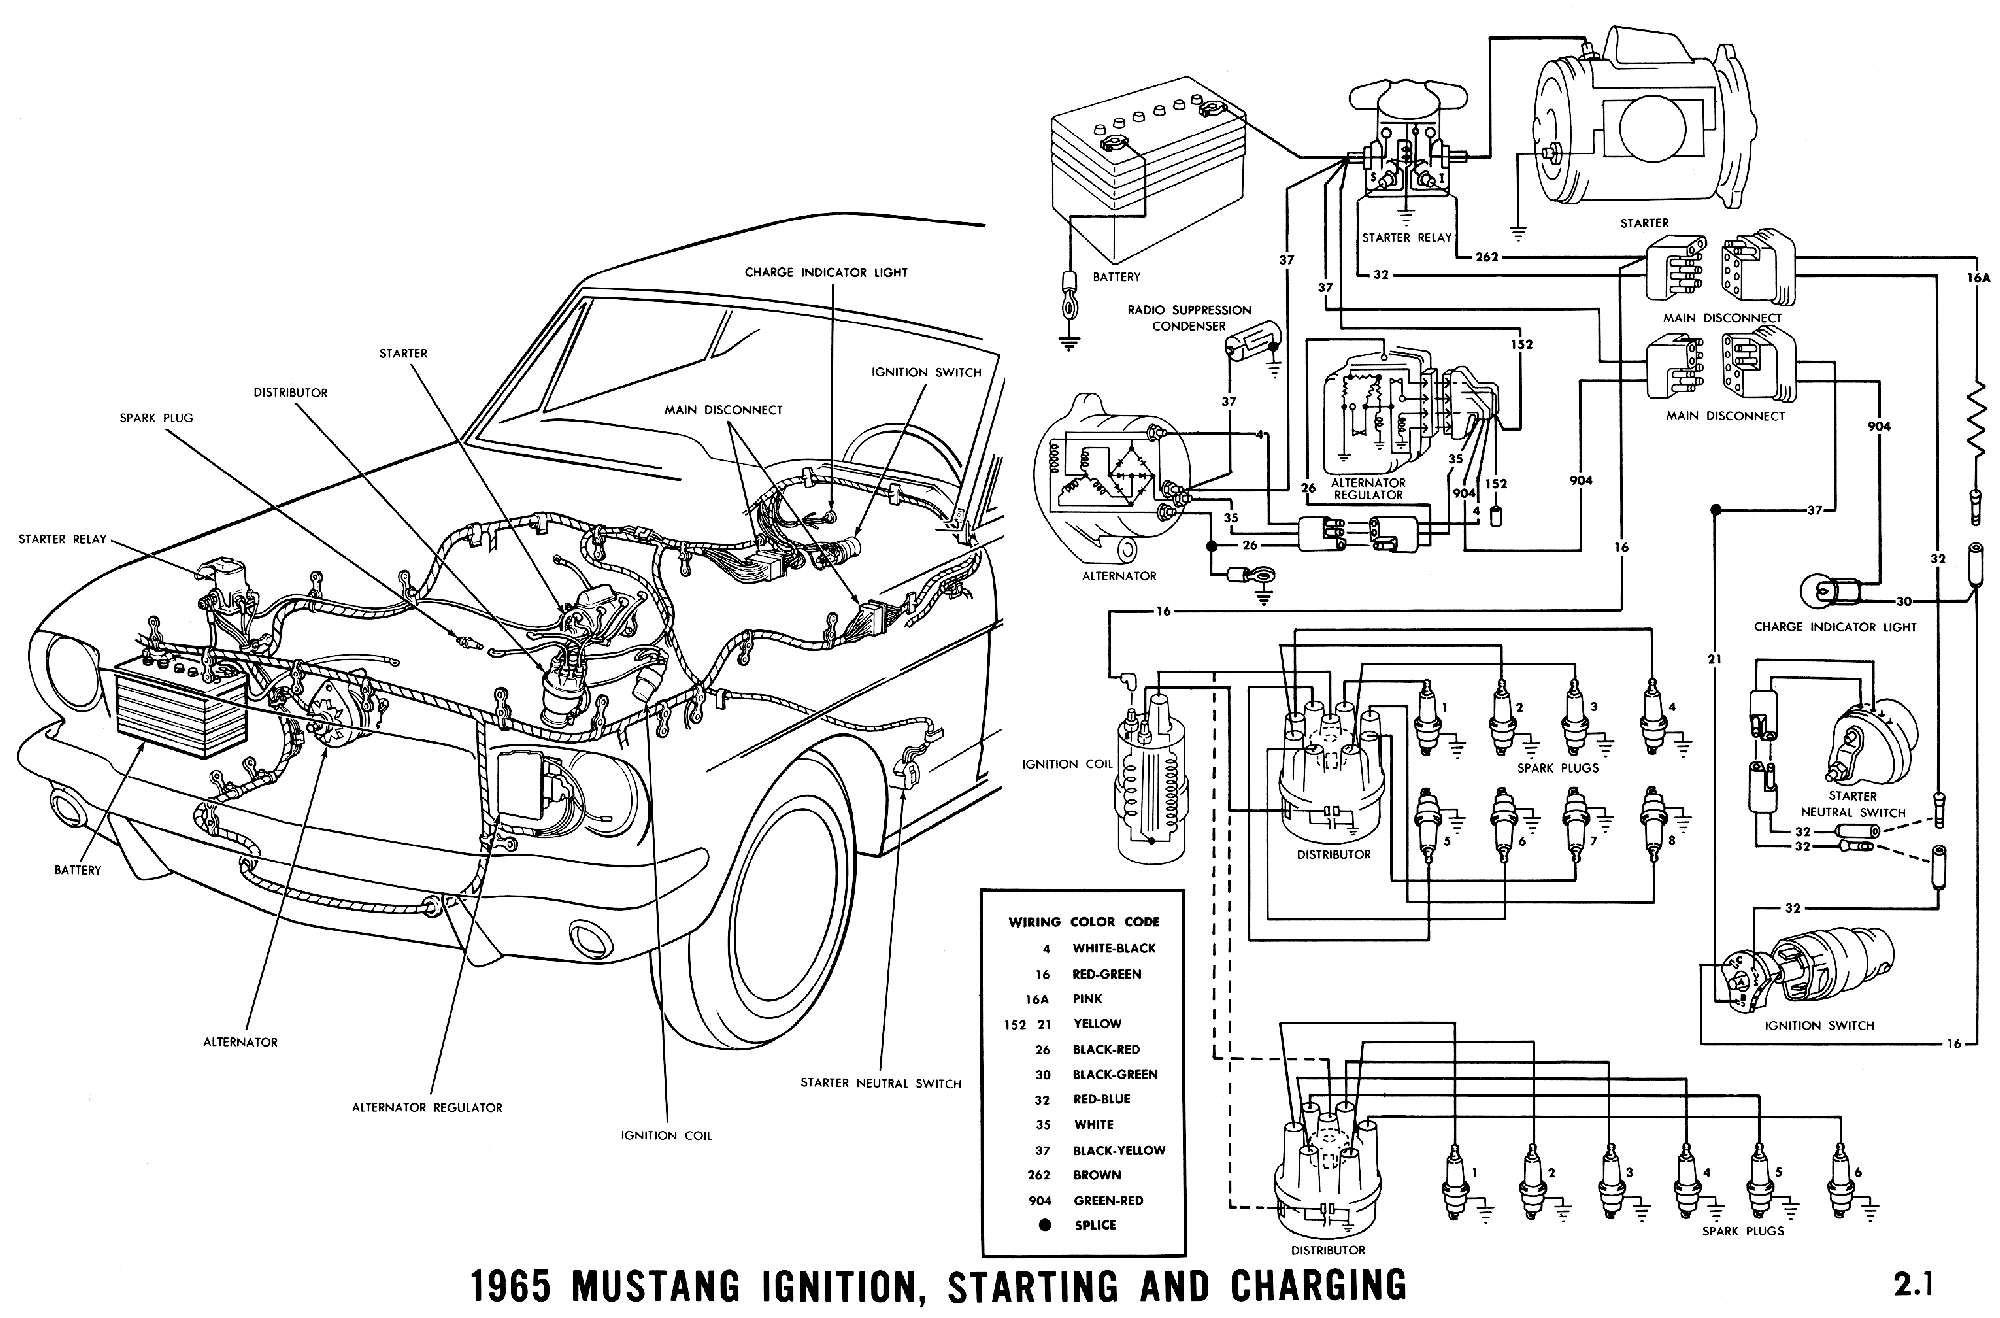 1965 Mustang Wiring Diagram 1965 Mustang Wiring Diagrams Average Joe Restoration Brilliant ford Of 1965 Mustang Wiring Diagram